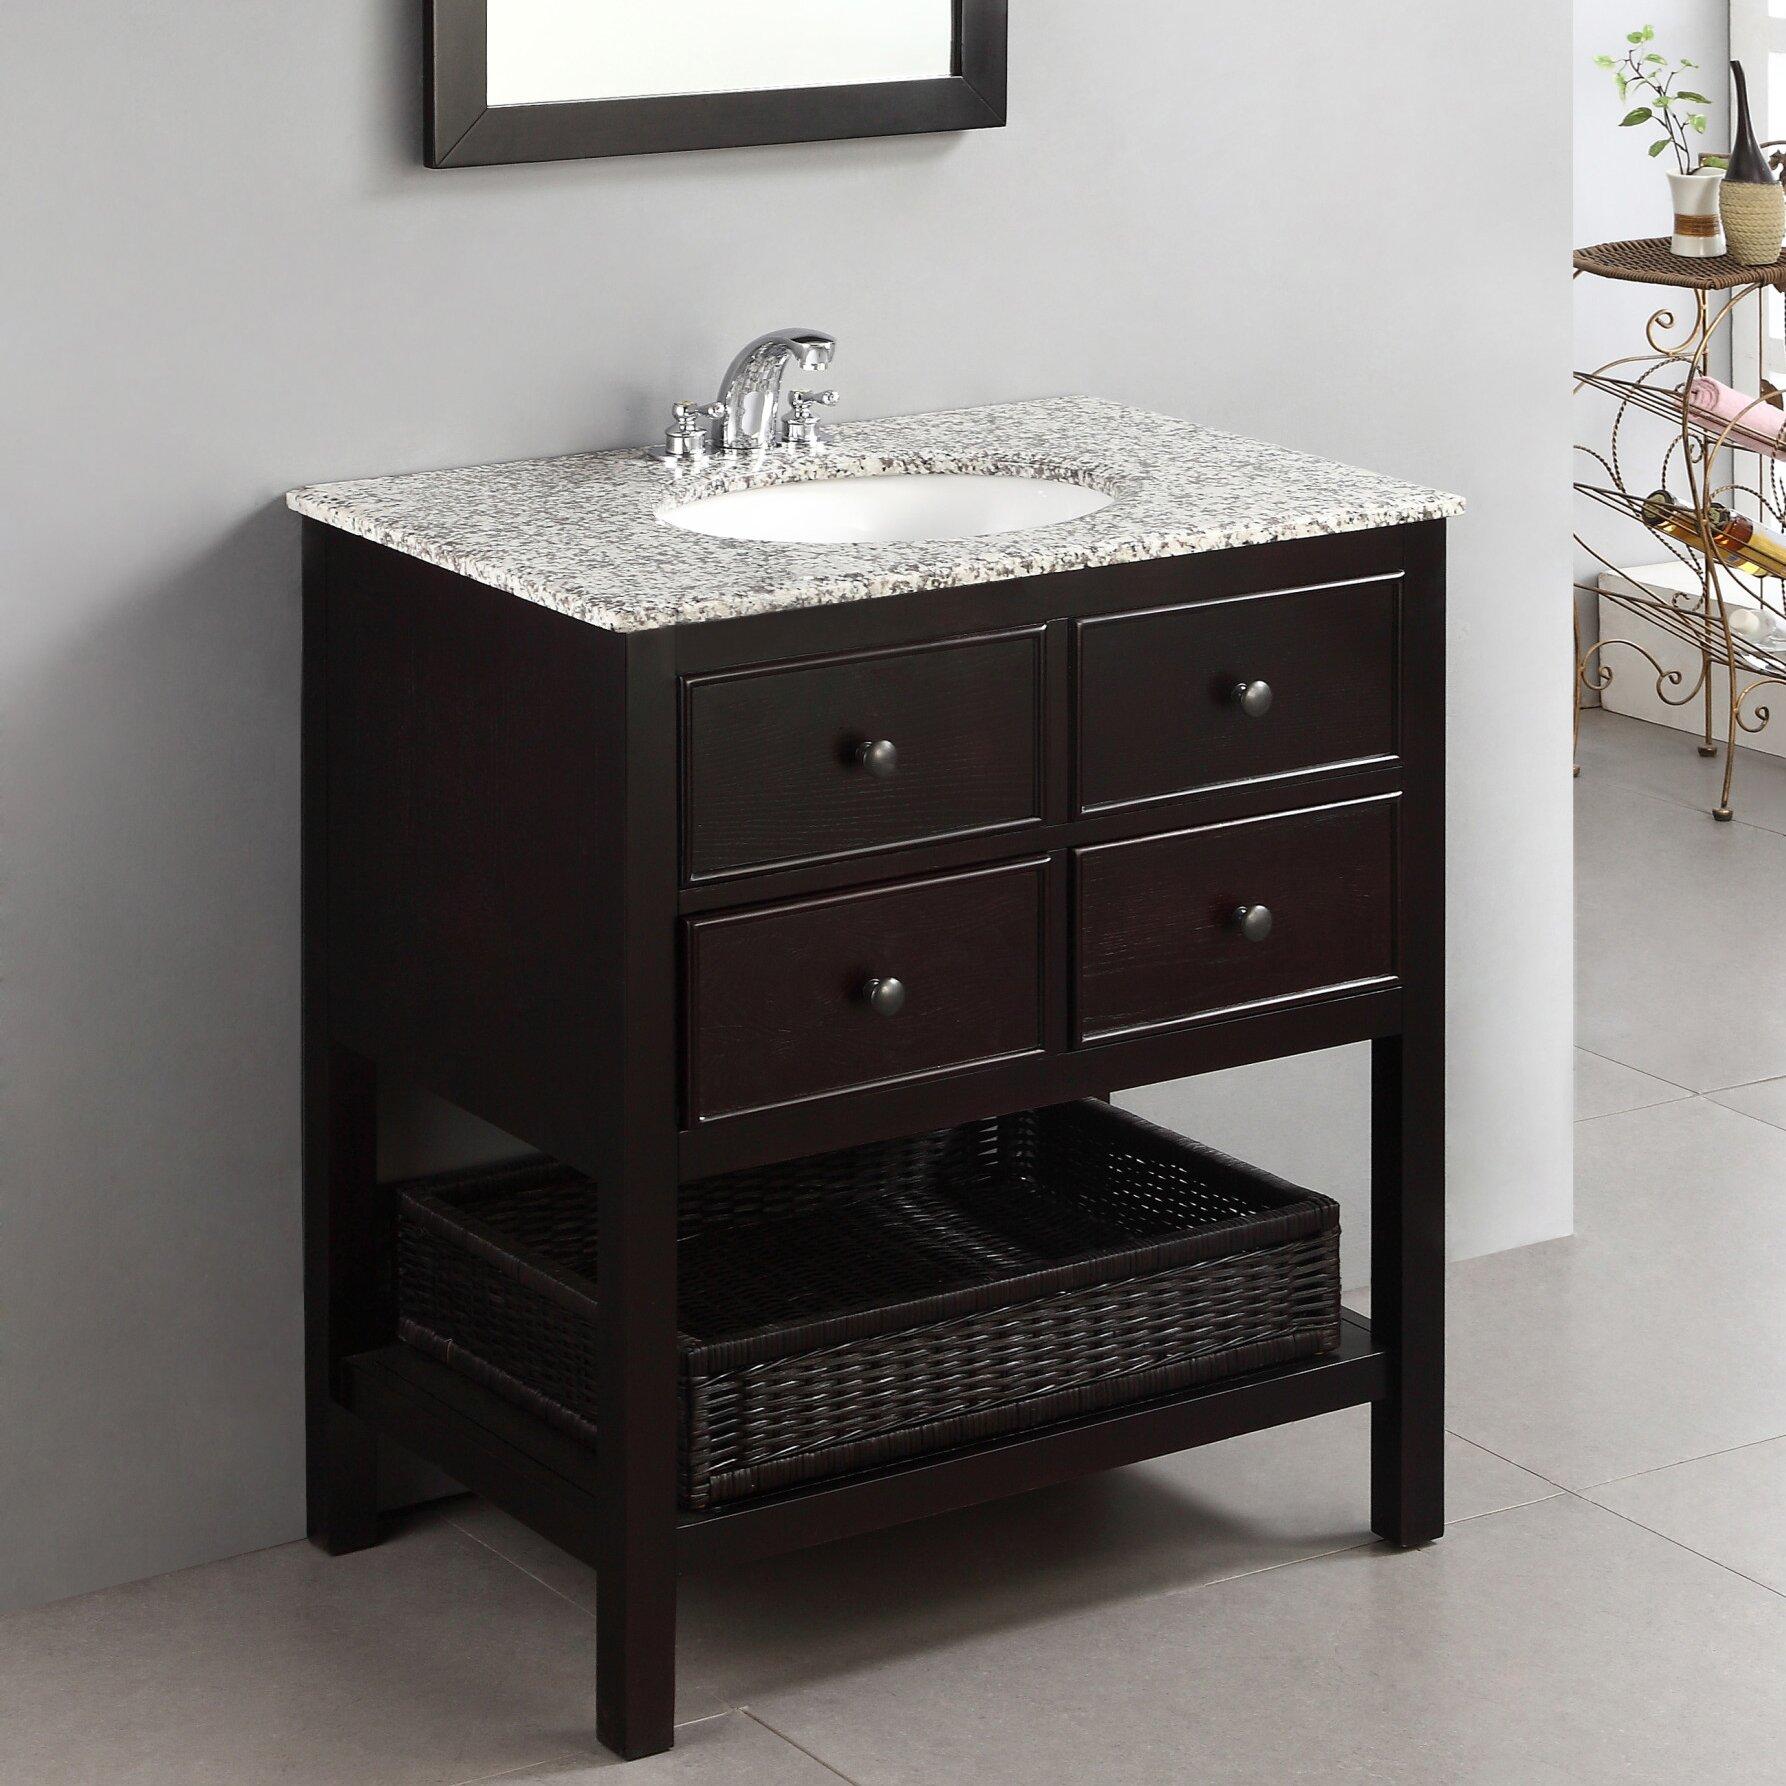 Alcott Hill reg  Gettysburg 30 quot  Single Bathroom Vanity Set. Alcott Hill Gettysburg 30  Single Bathroom Vanity Set   Reviews